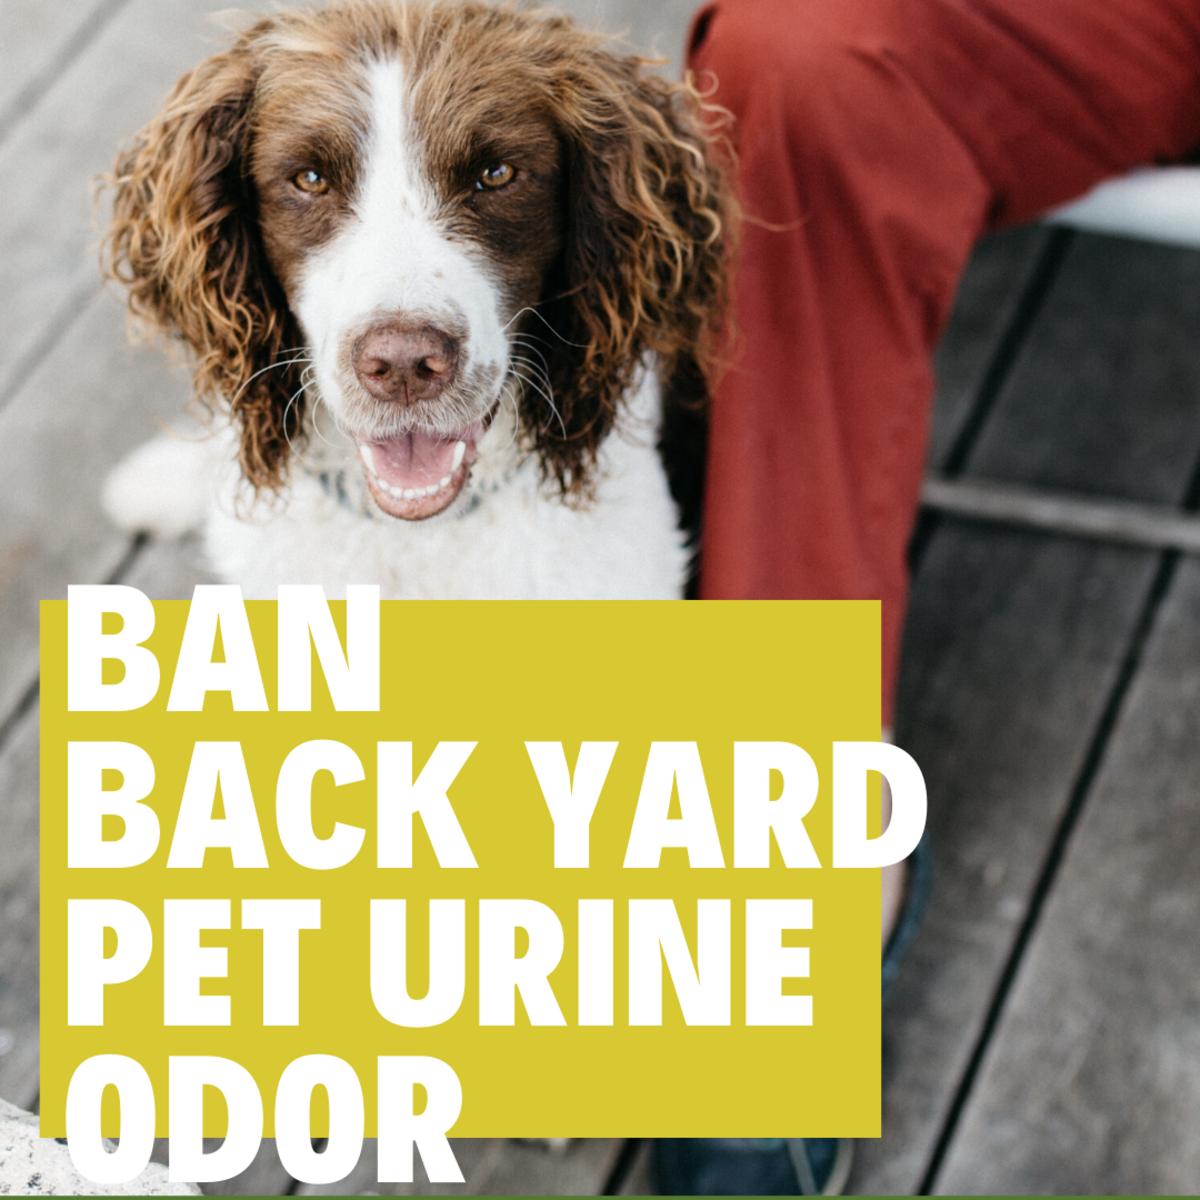 Get Rid of Pet Urine Odor